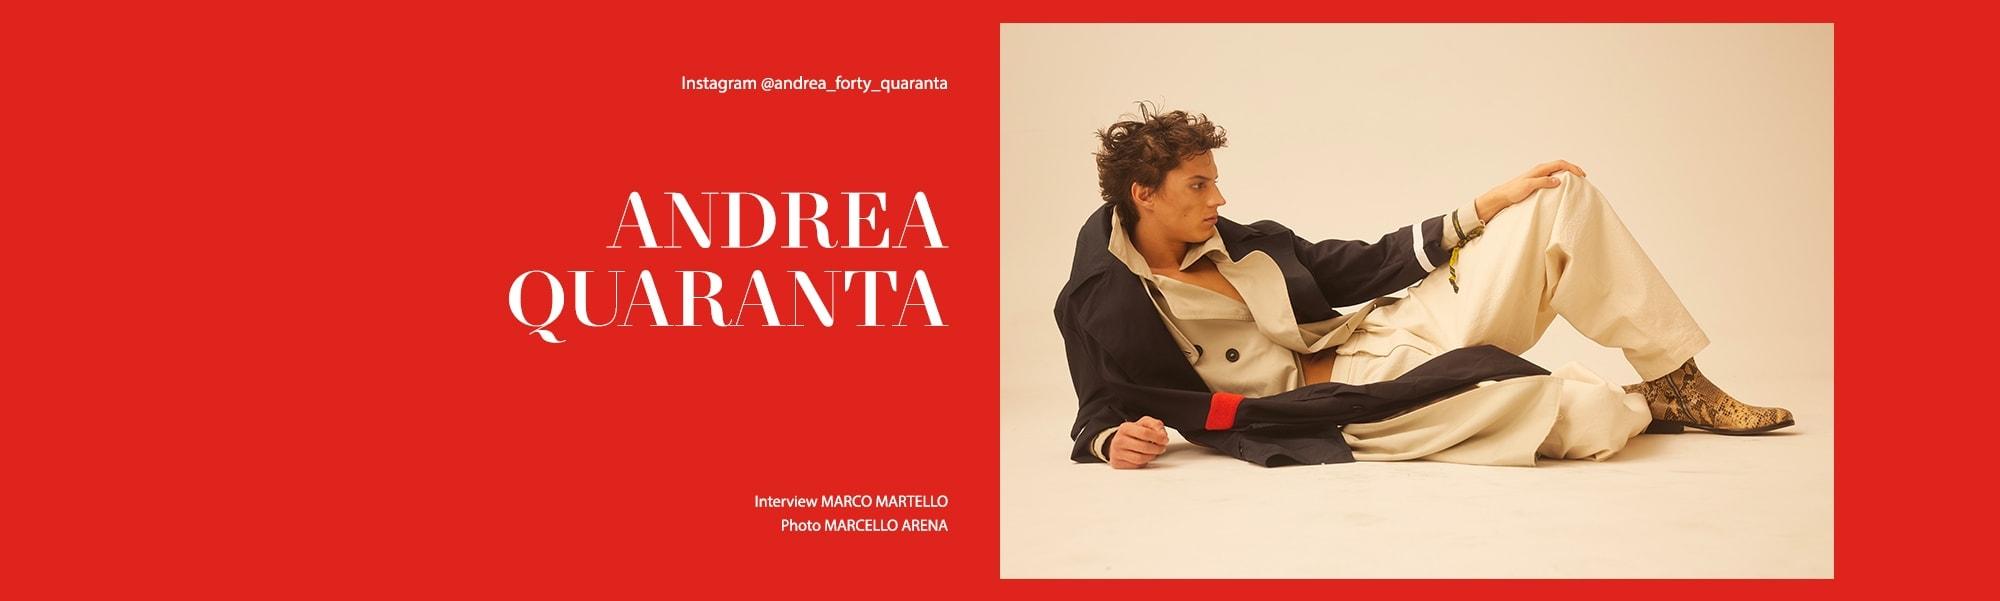 andrea-quaranta_banner3_thegreatestmagazine